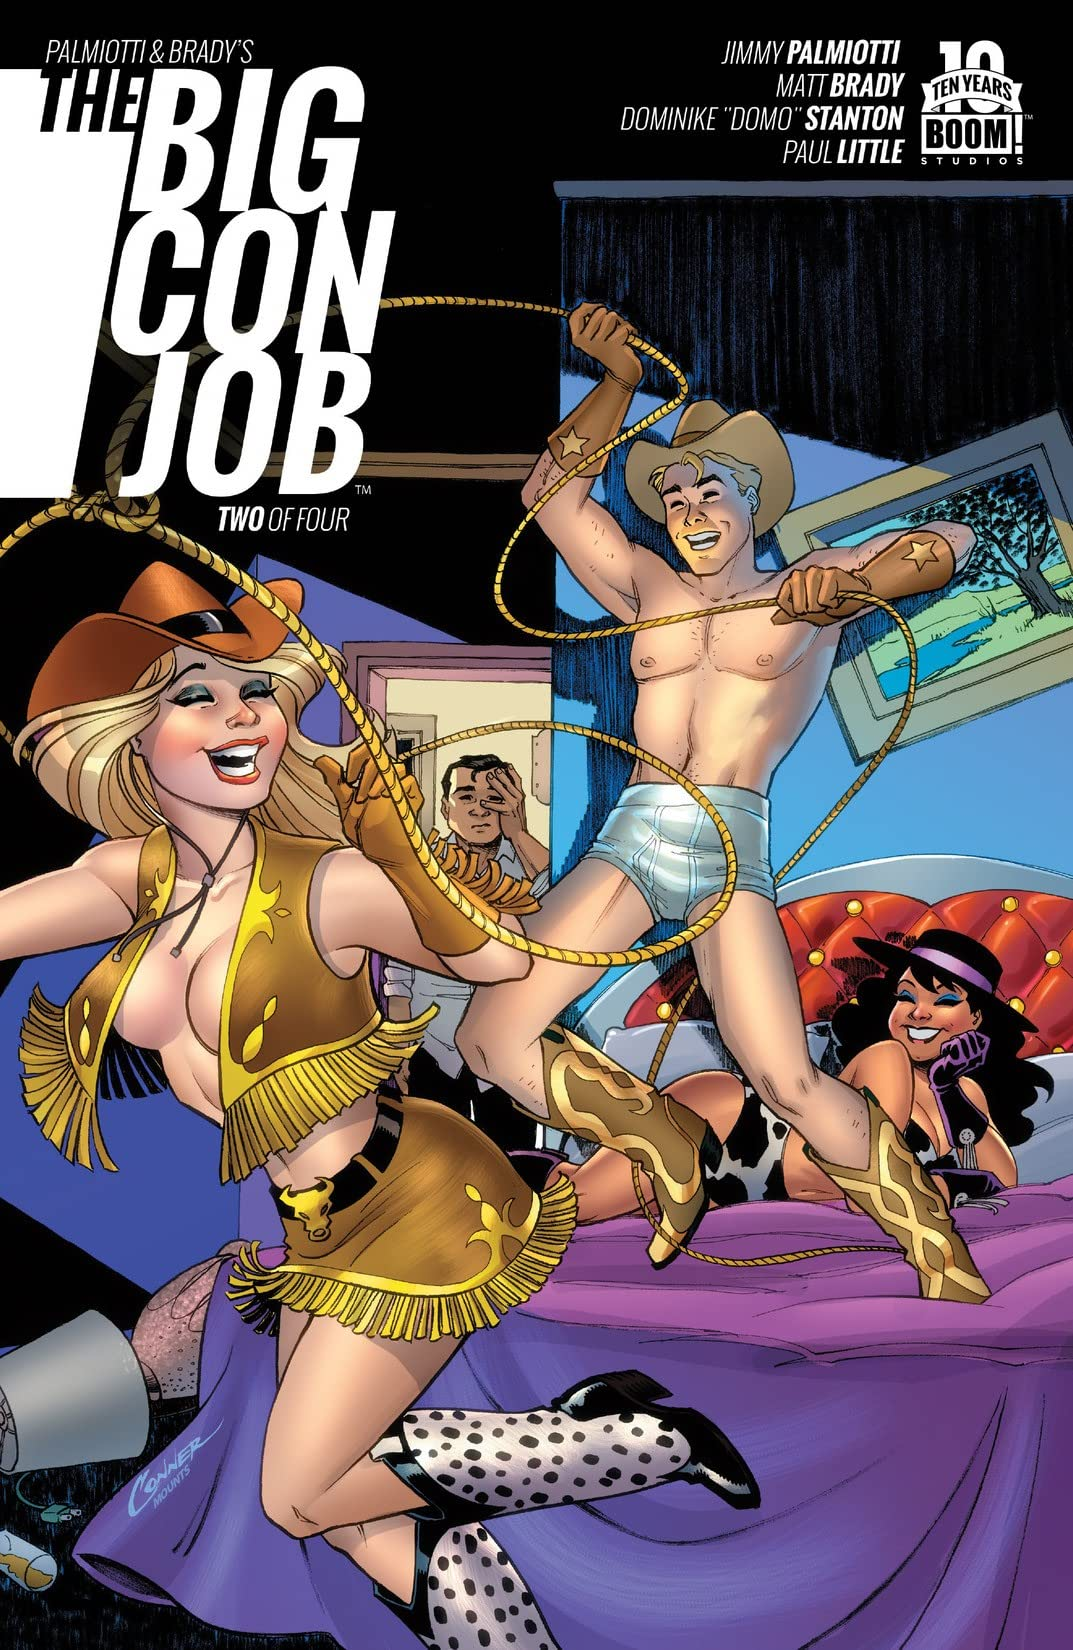 Palmiotti and Brady's The Big Con Job #2 (of 4)